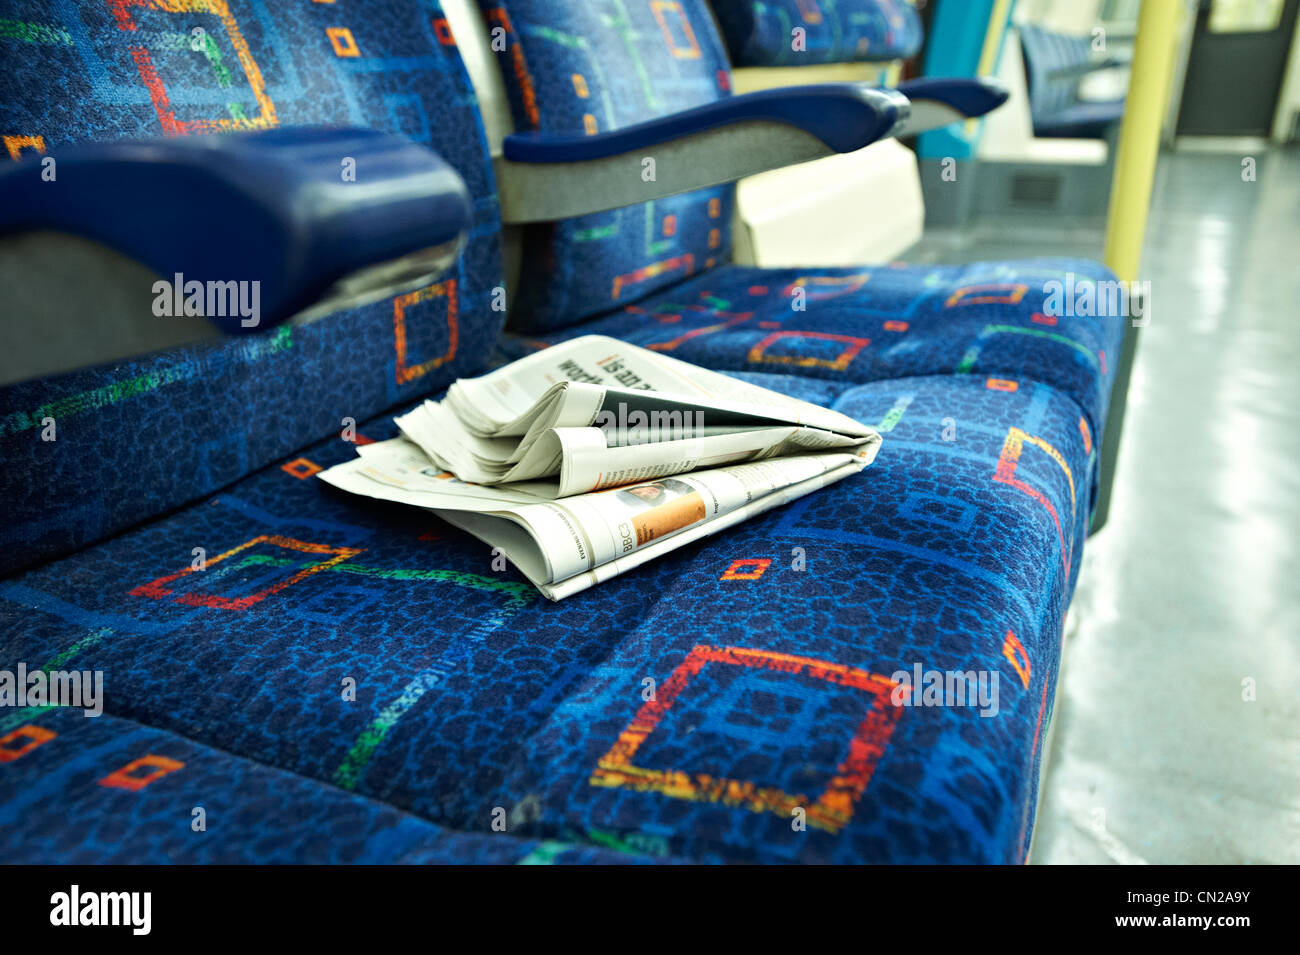 Rubbish on a tube train - Stock Image